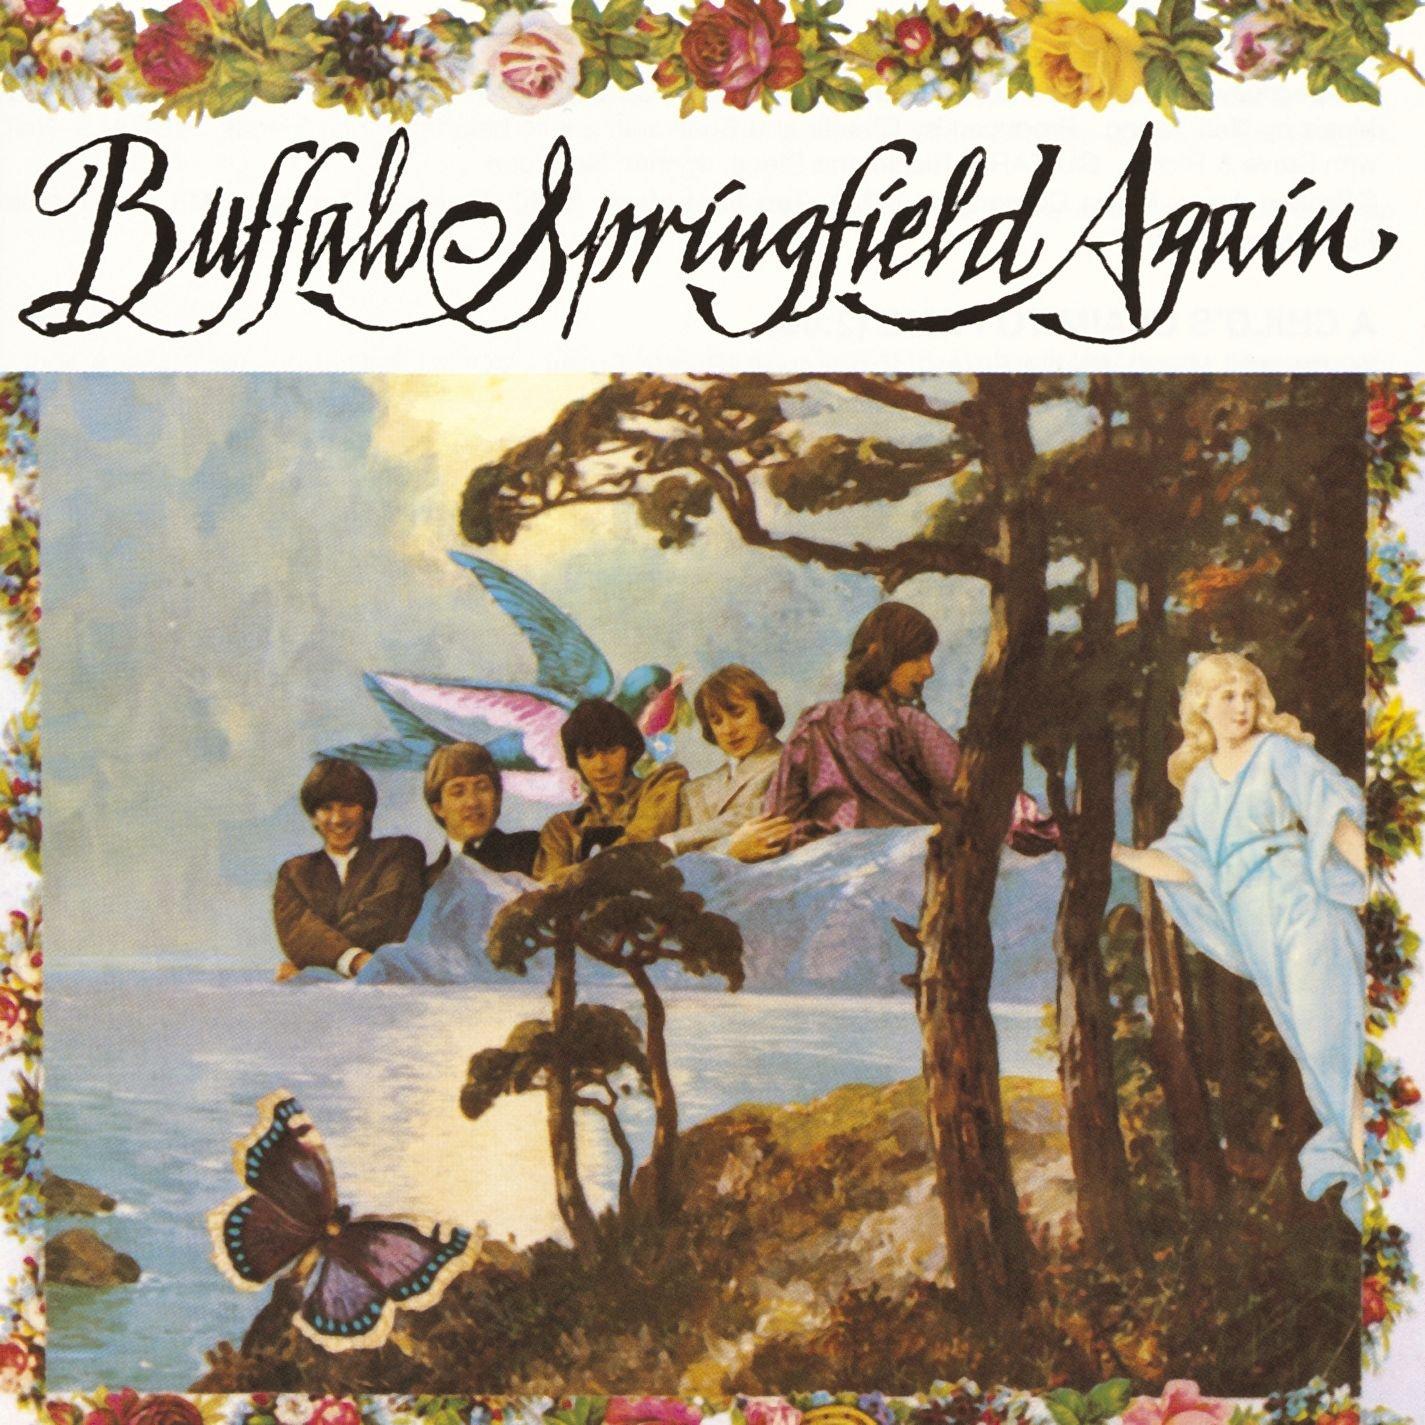 Buffalo Springfield - Buffalo Springfield Again [LP]